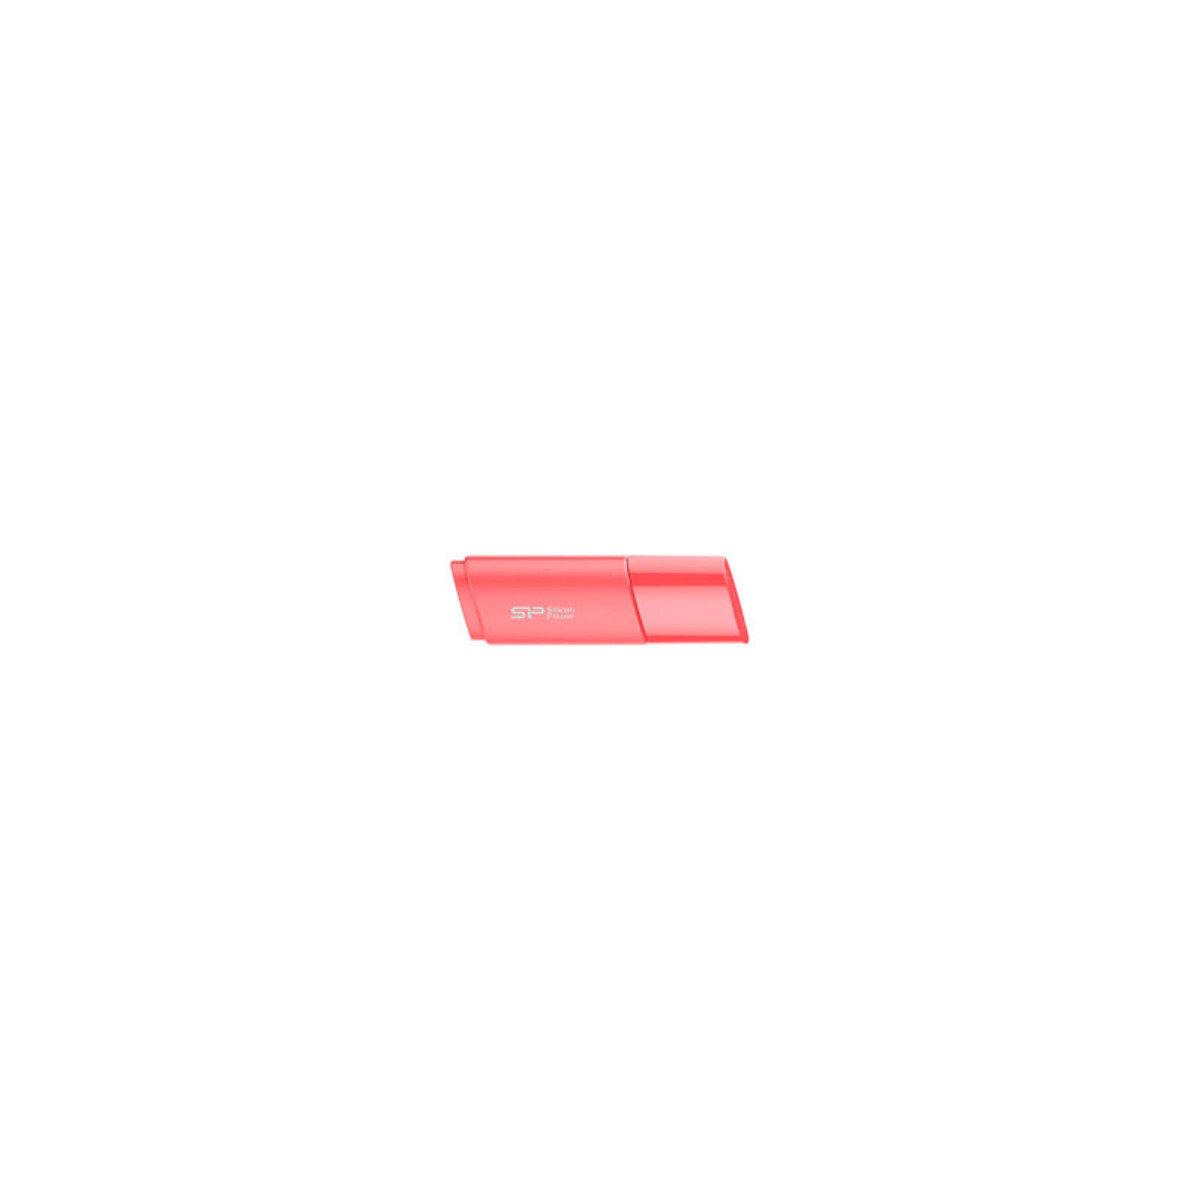 USB2.0快閃記憶棒 Ultima U06 64GB 桃粉紅